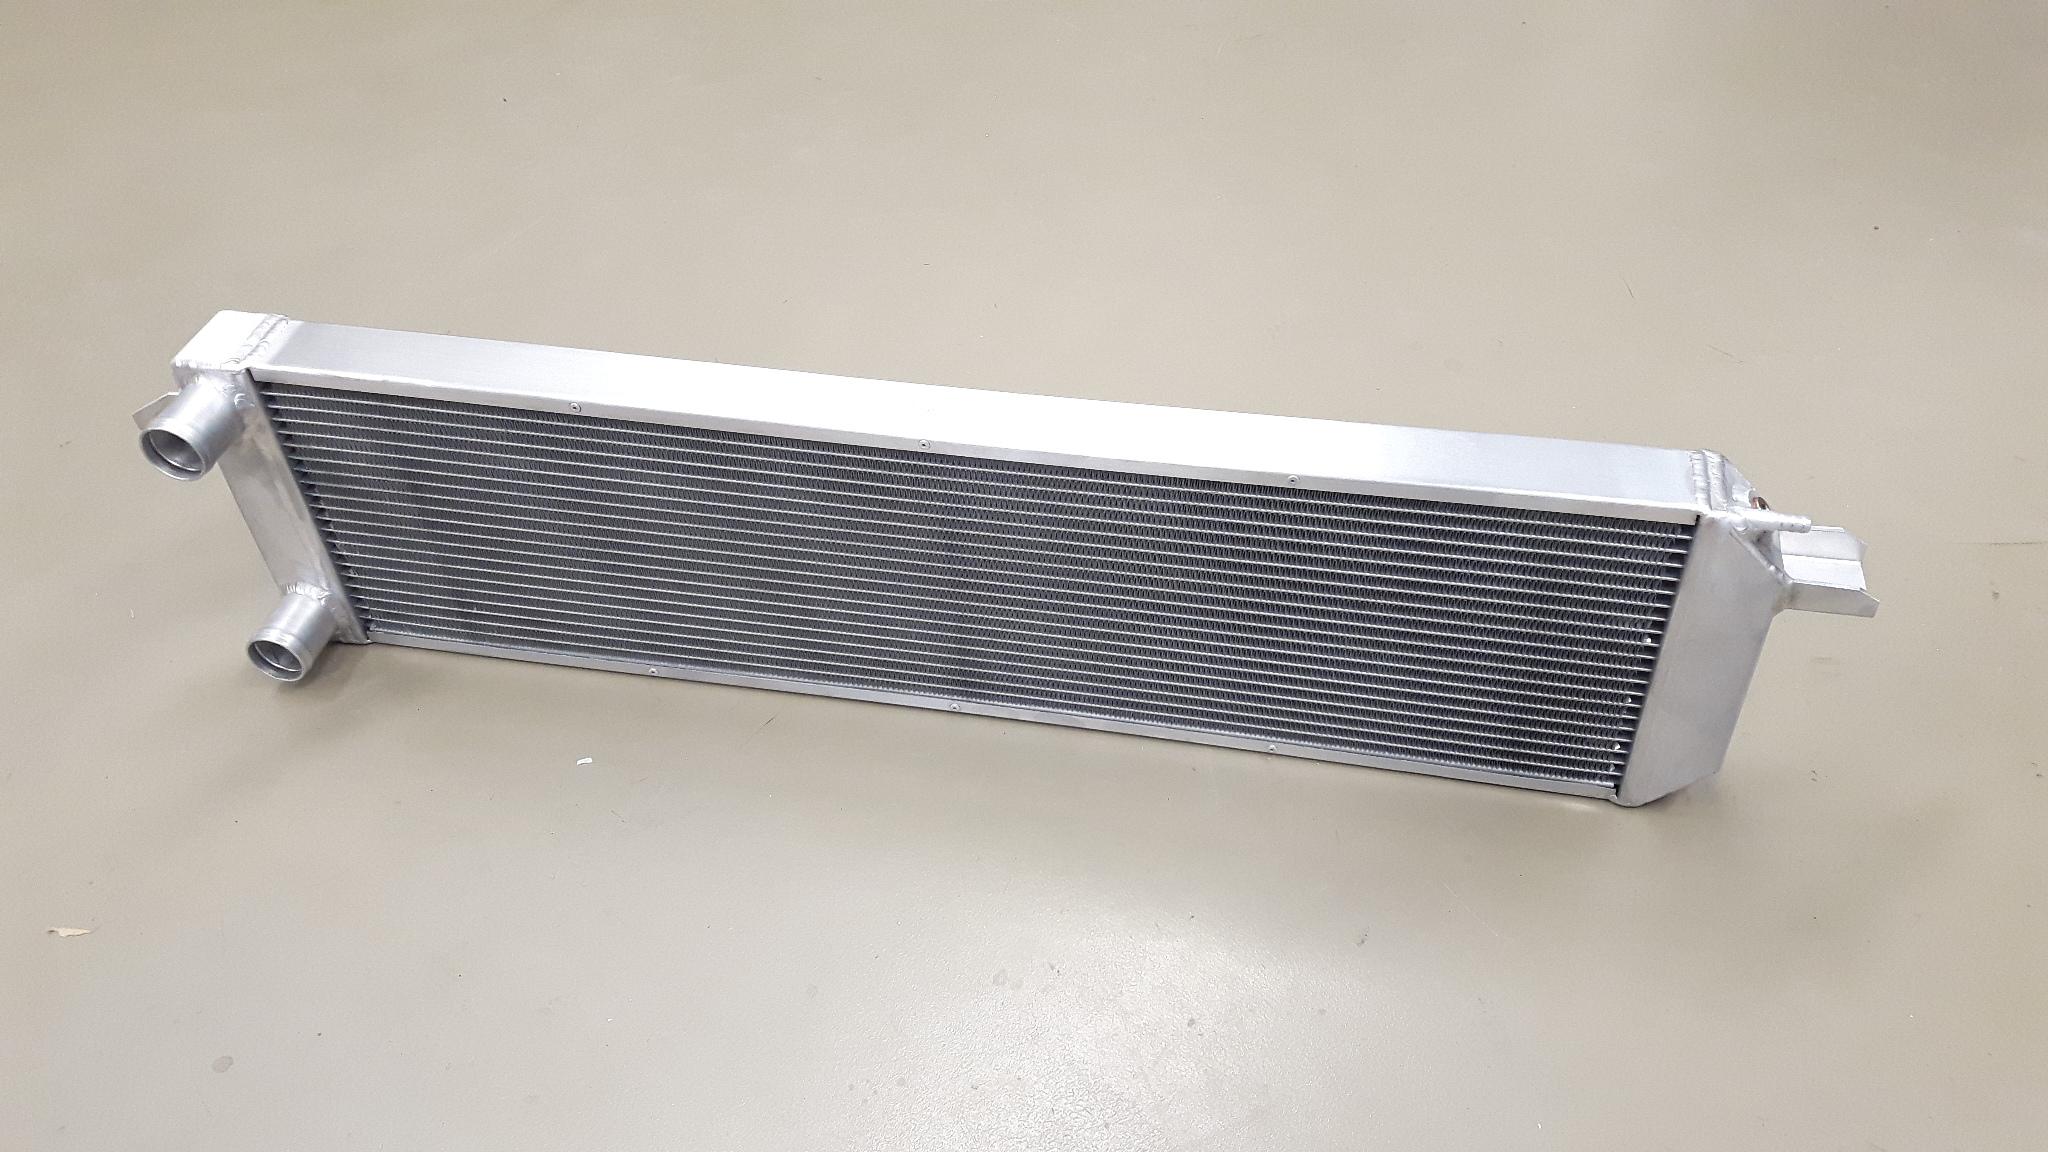 VW Golf VR6 aluminium high performance radiateur.-0